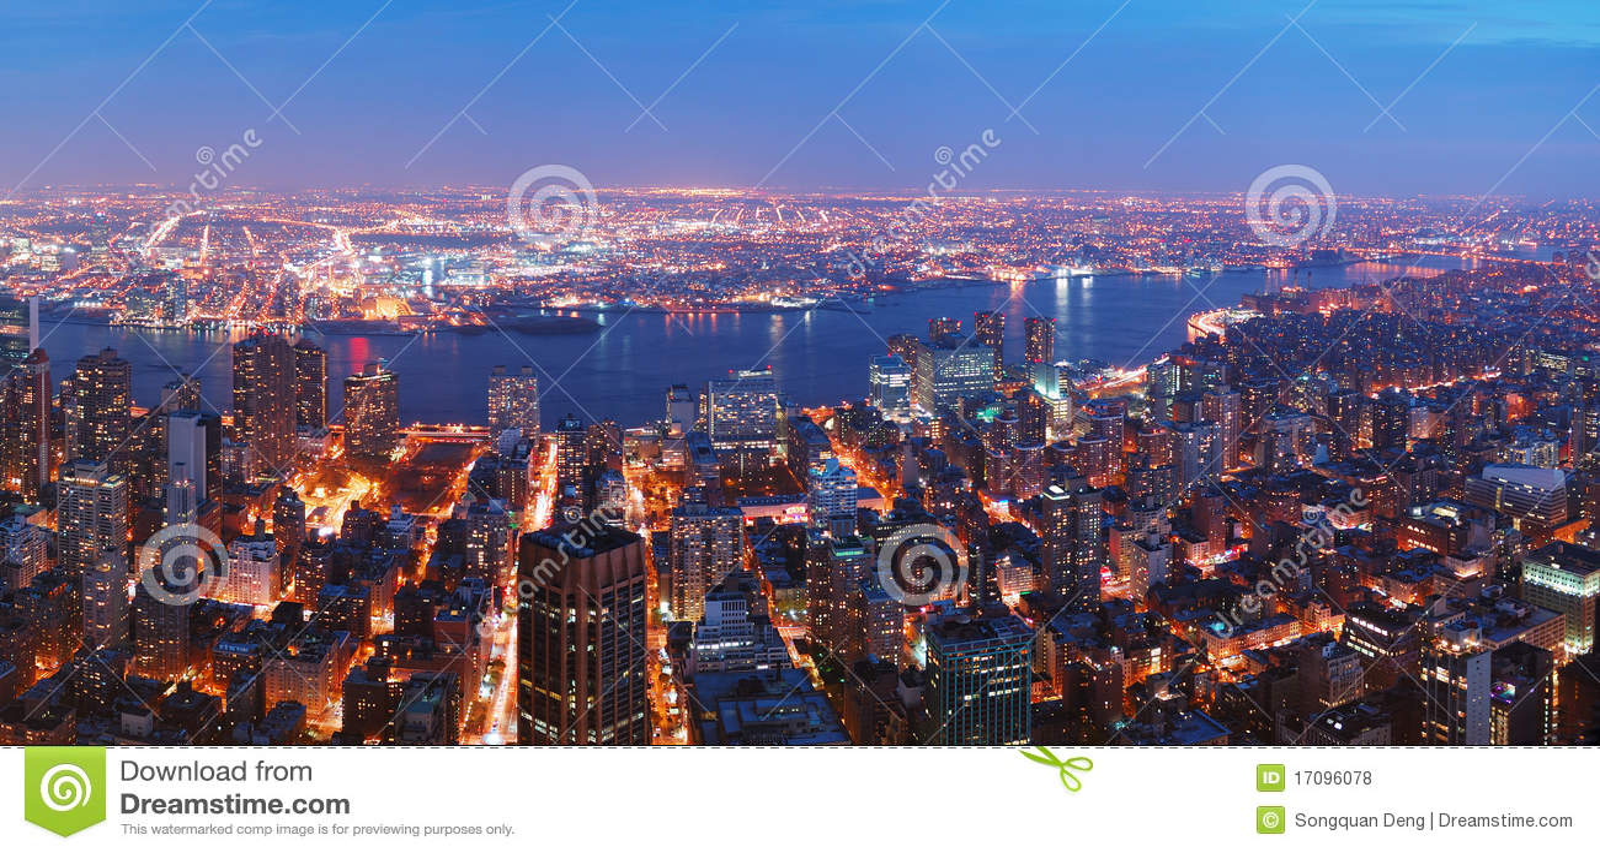 Skyline New- York Citymanhattan